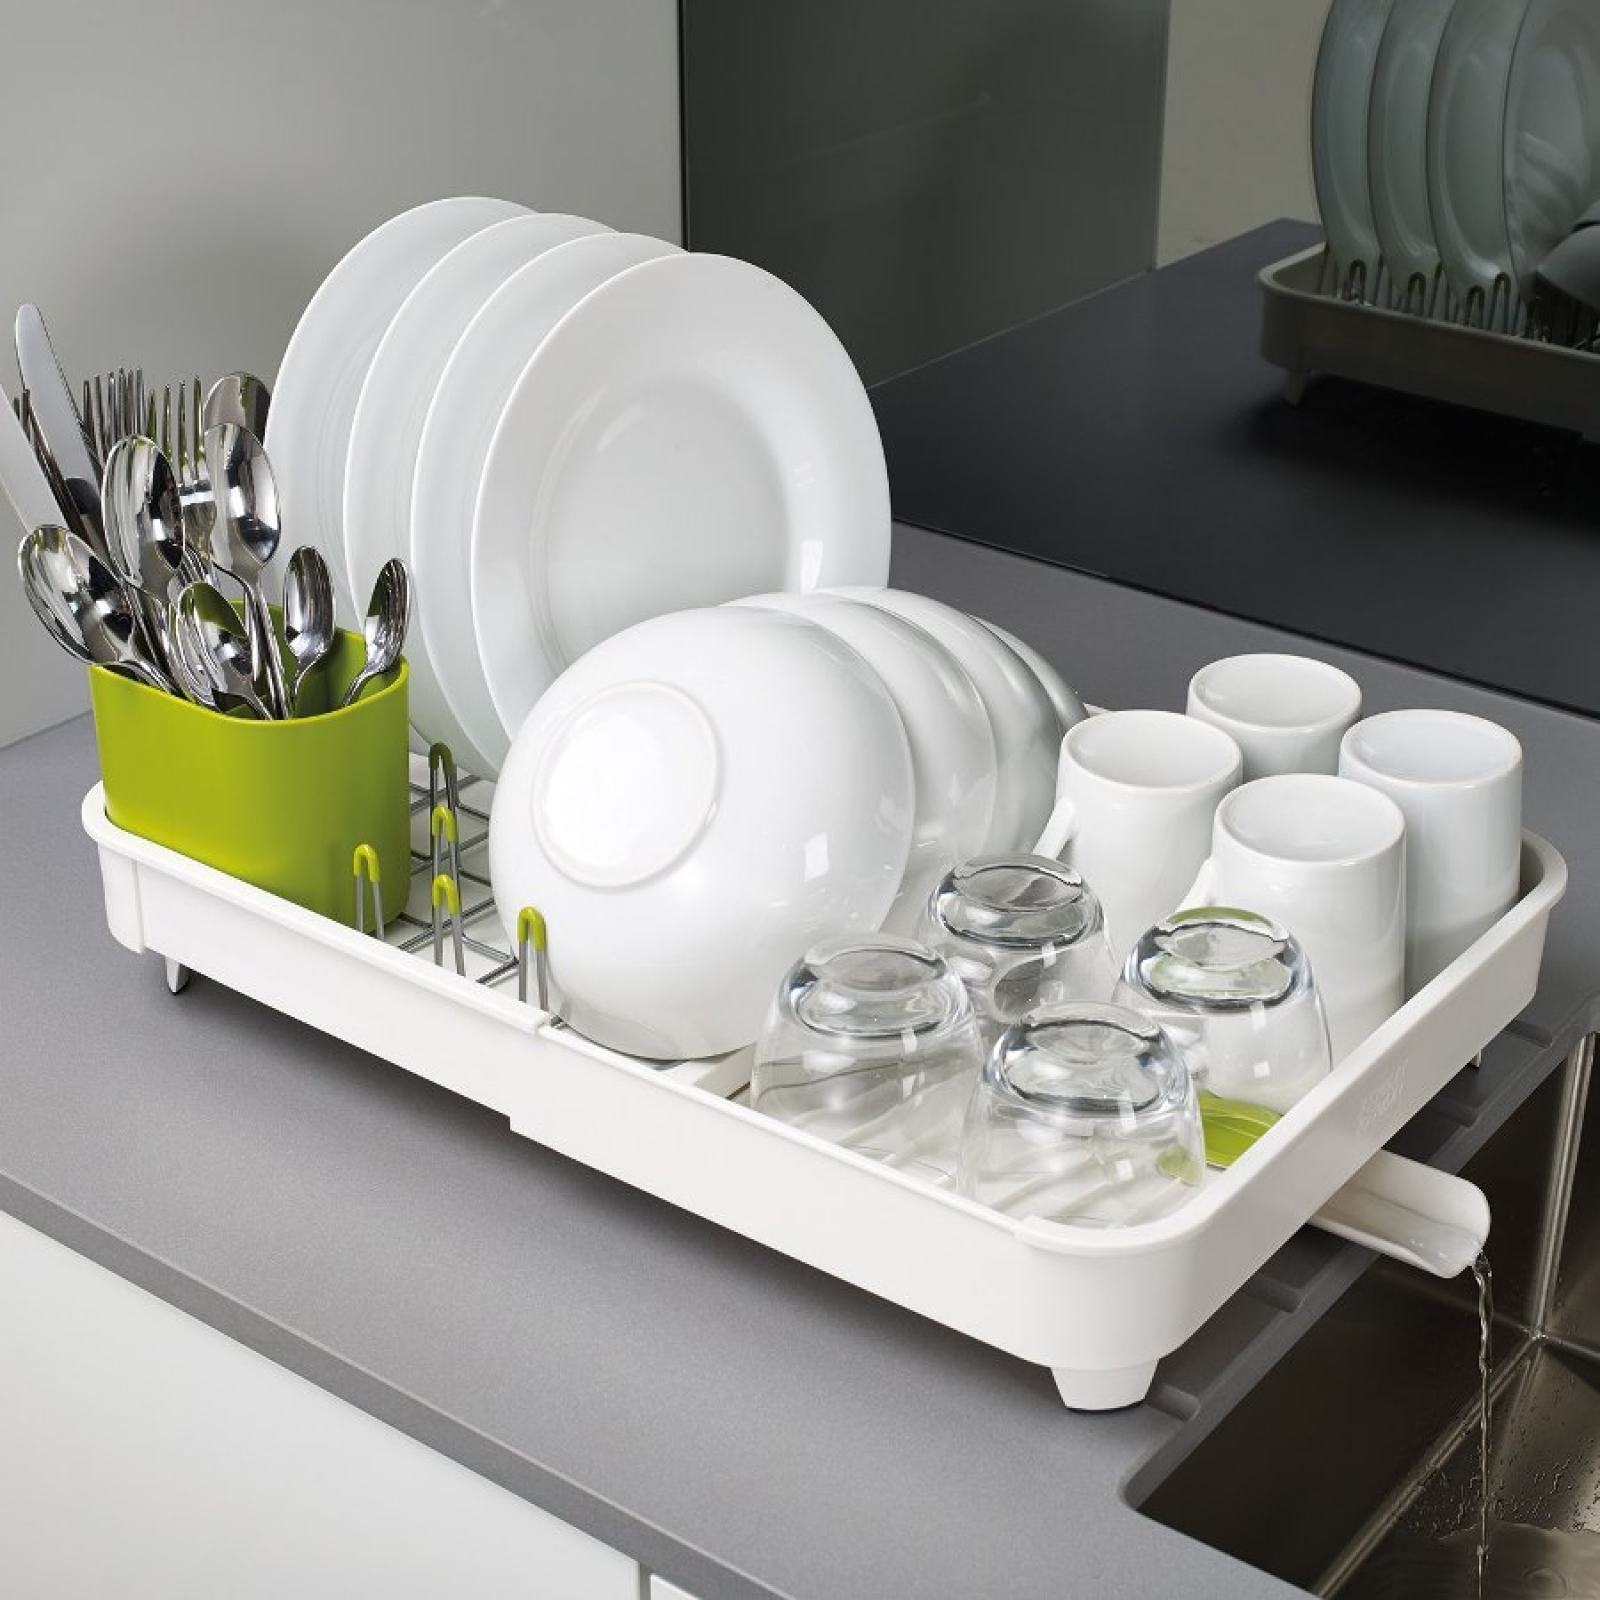 Сушилка для посуды раздвижная Joseph Joseph extend, 32х16х36 см, белый Joseph Joseph 85071 фото 3